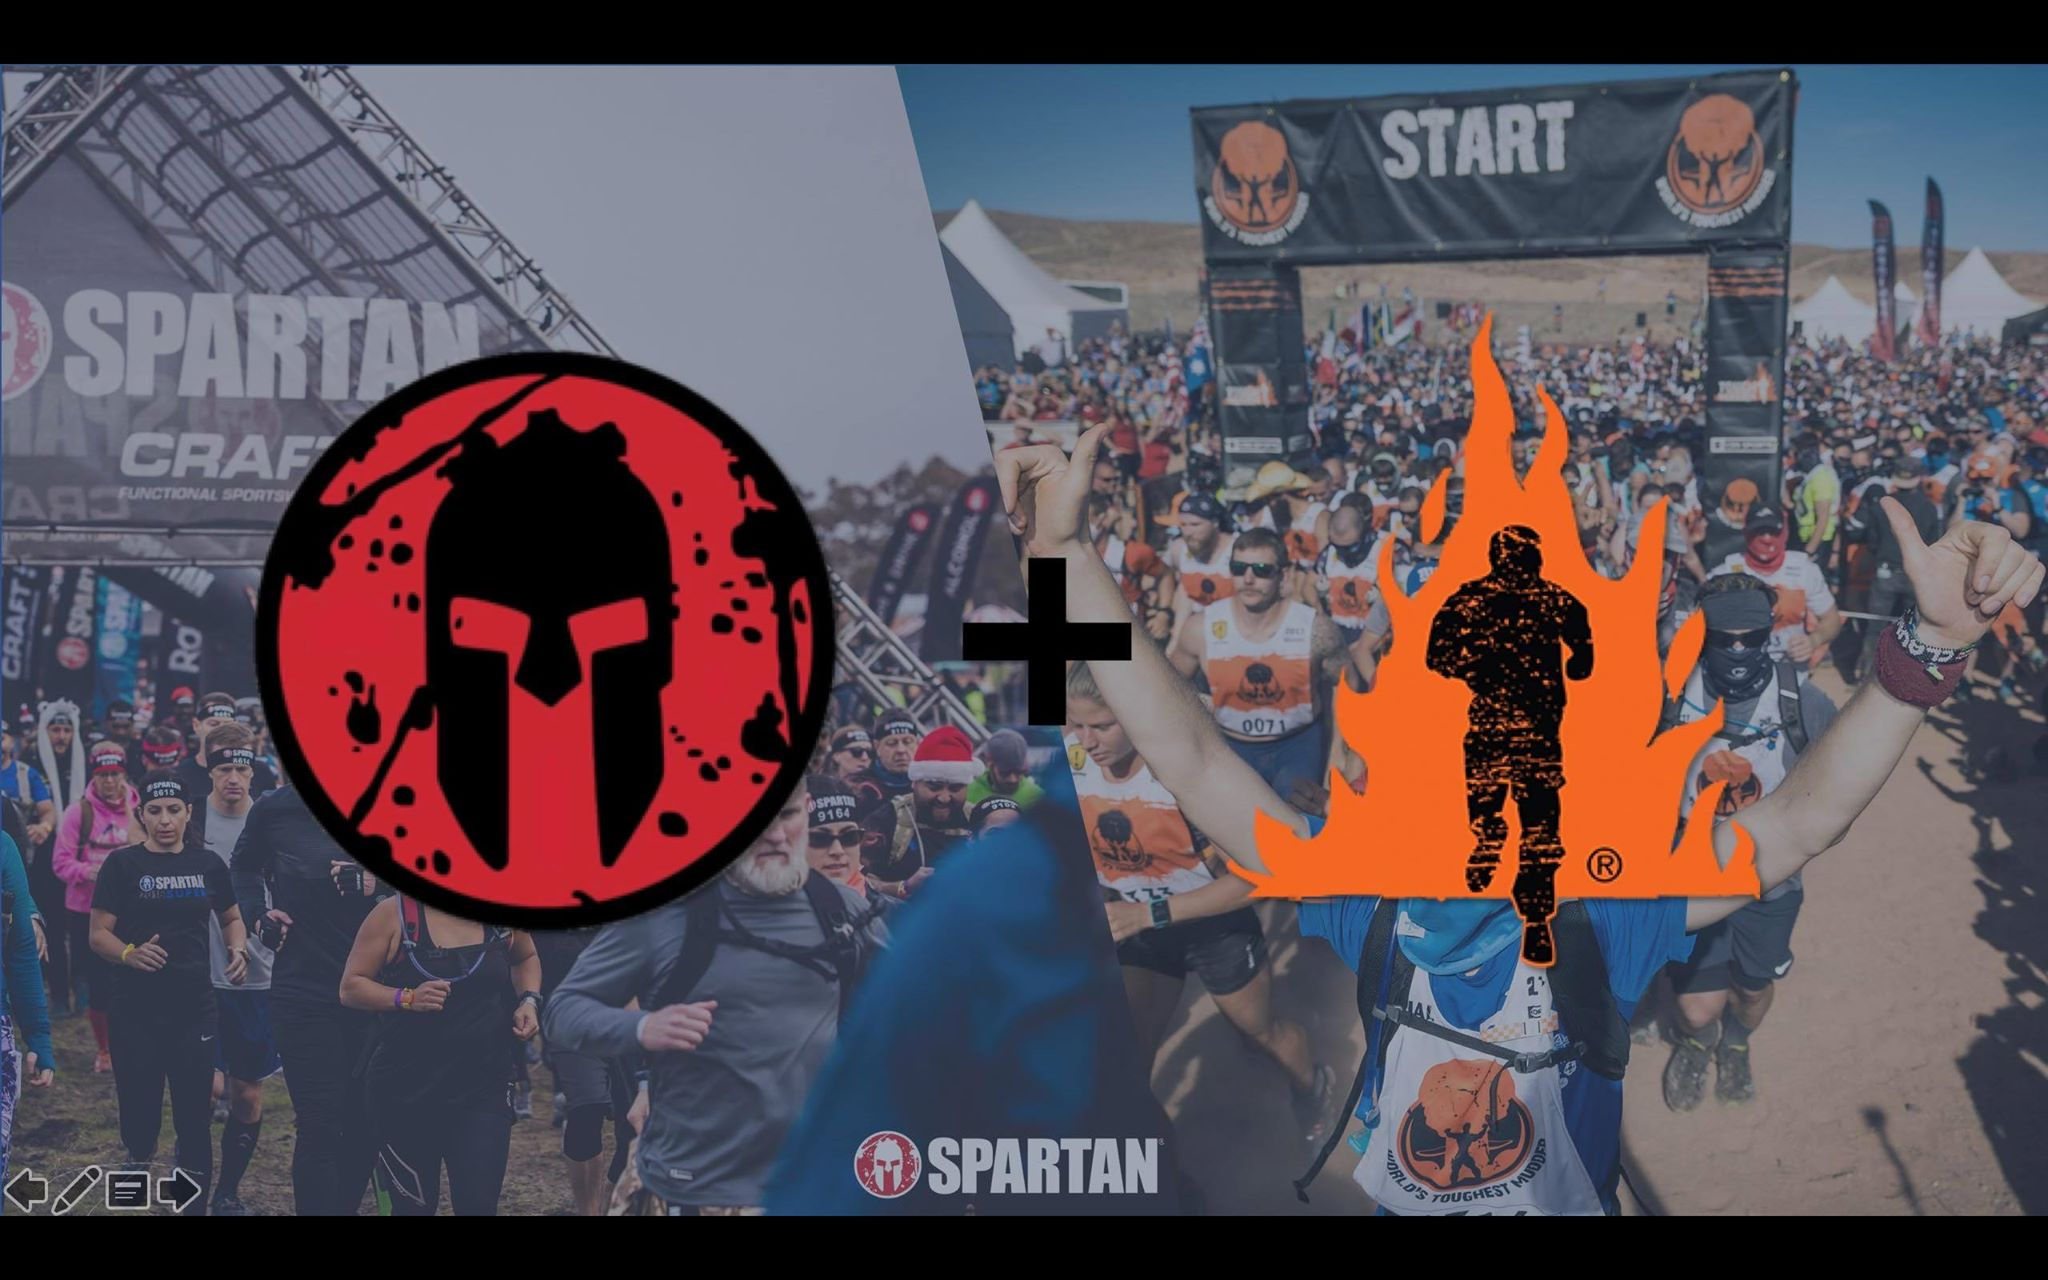 Spartan Race Acquires Tough Mudder